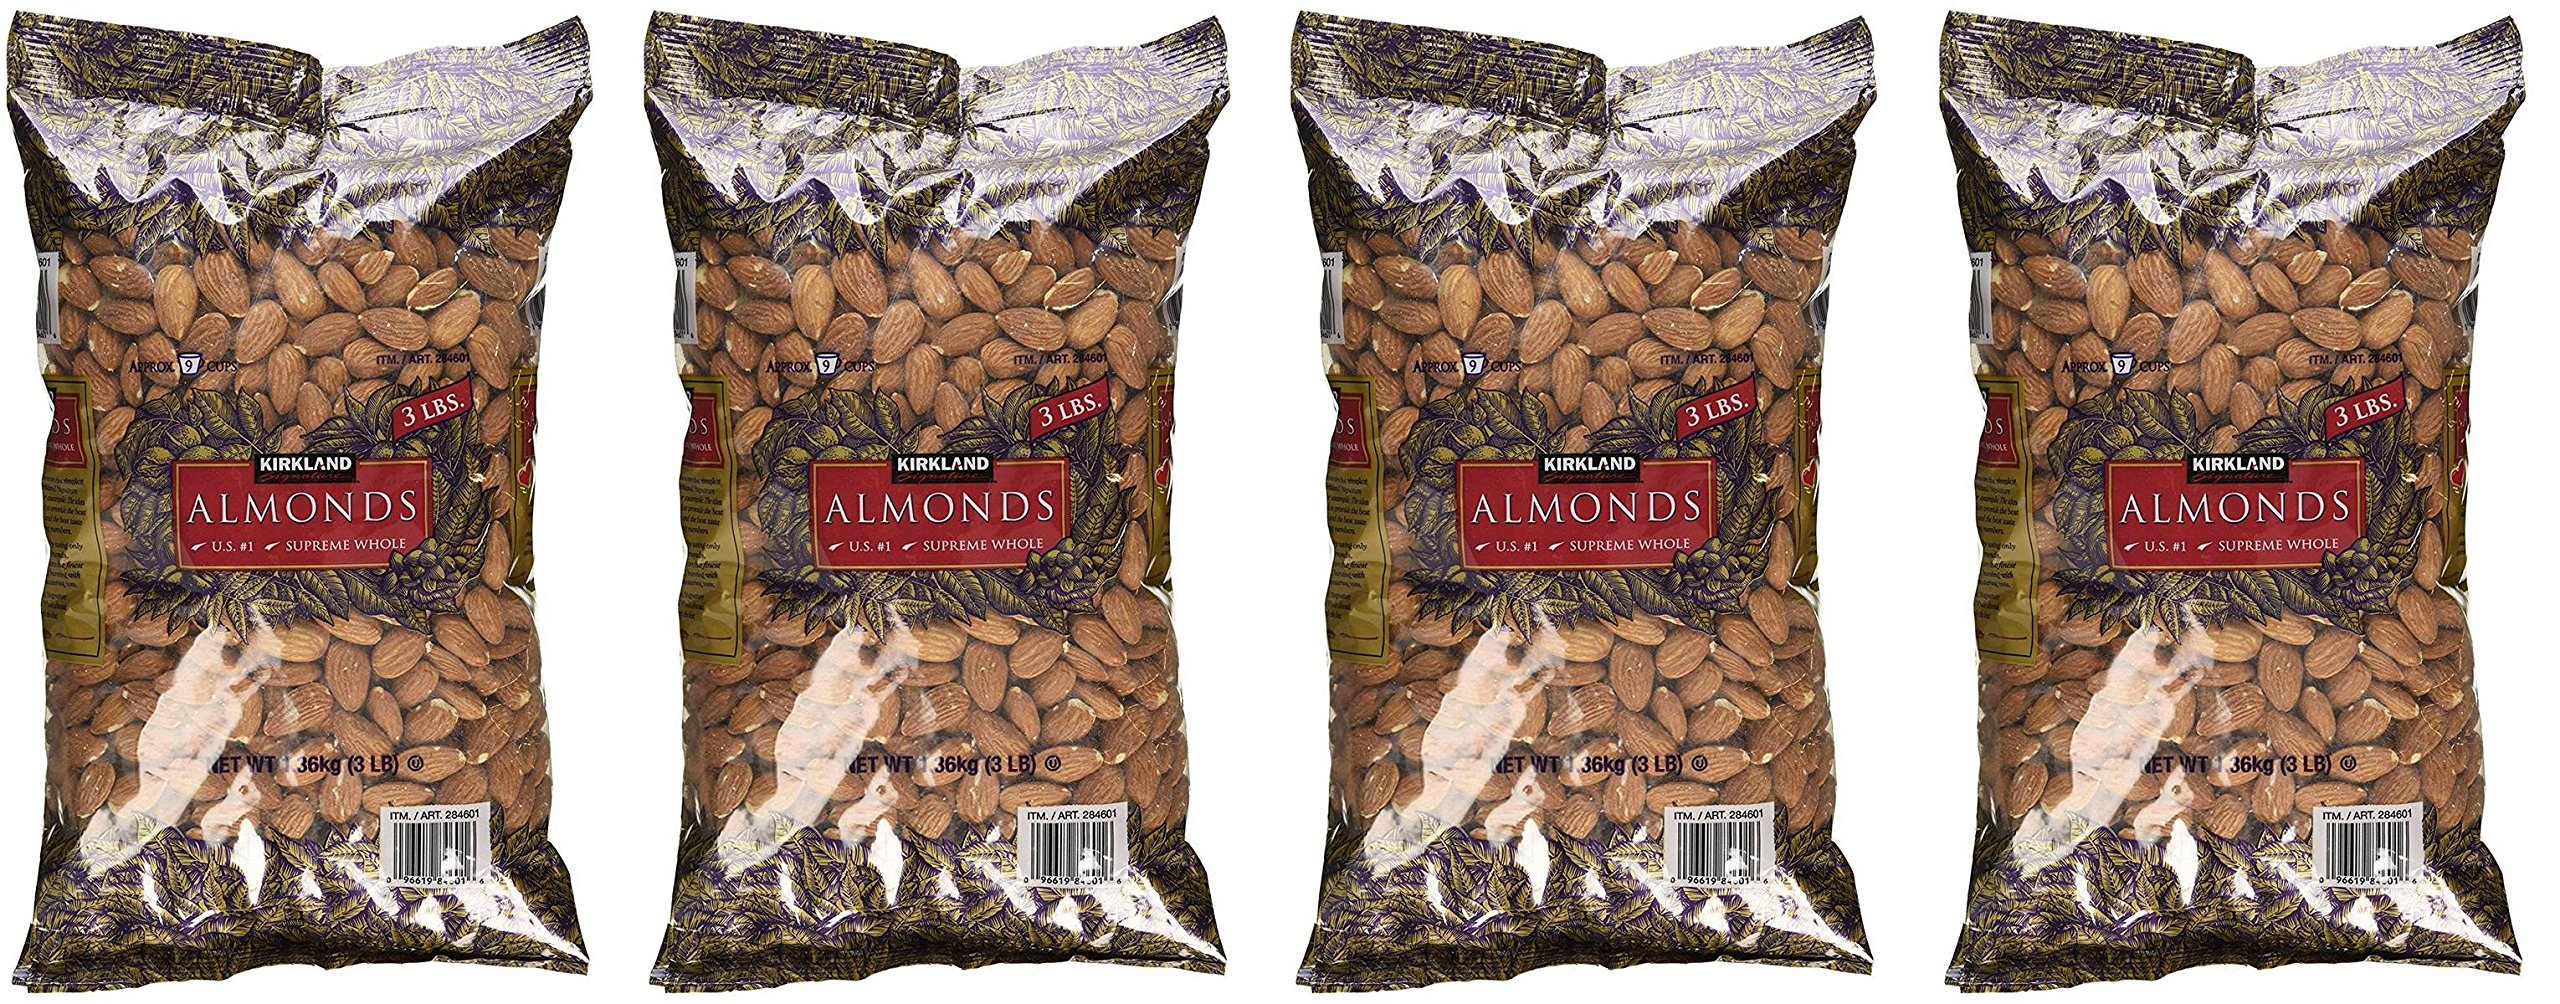 Kirkland Signature Supreme Whole Almonds, 4 Pack (3 Pounds)